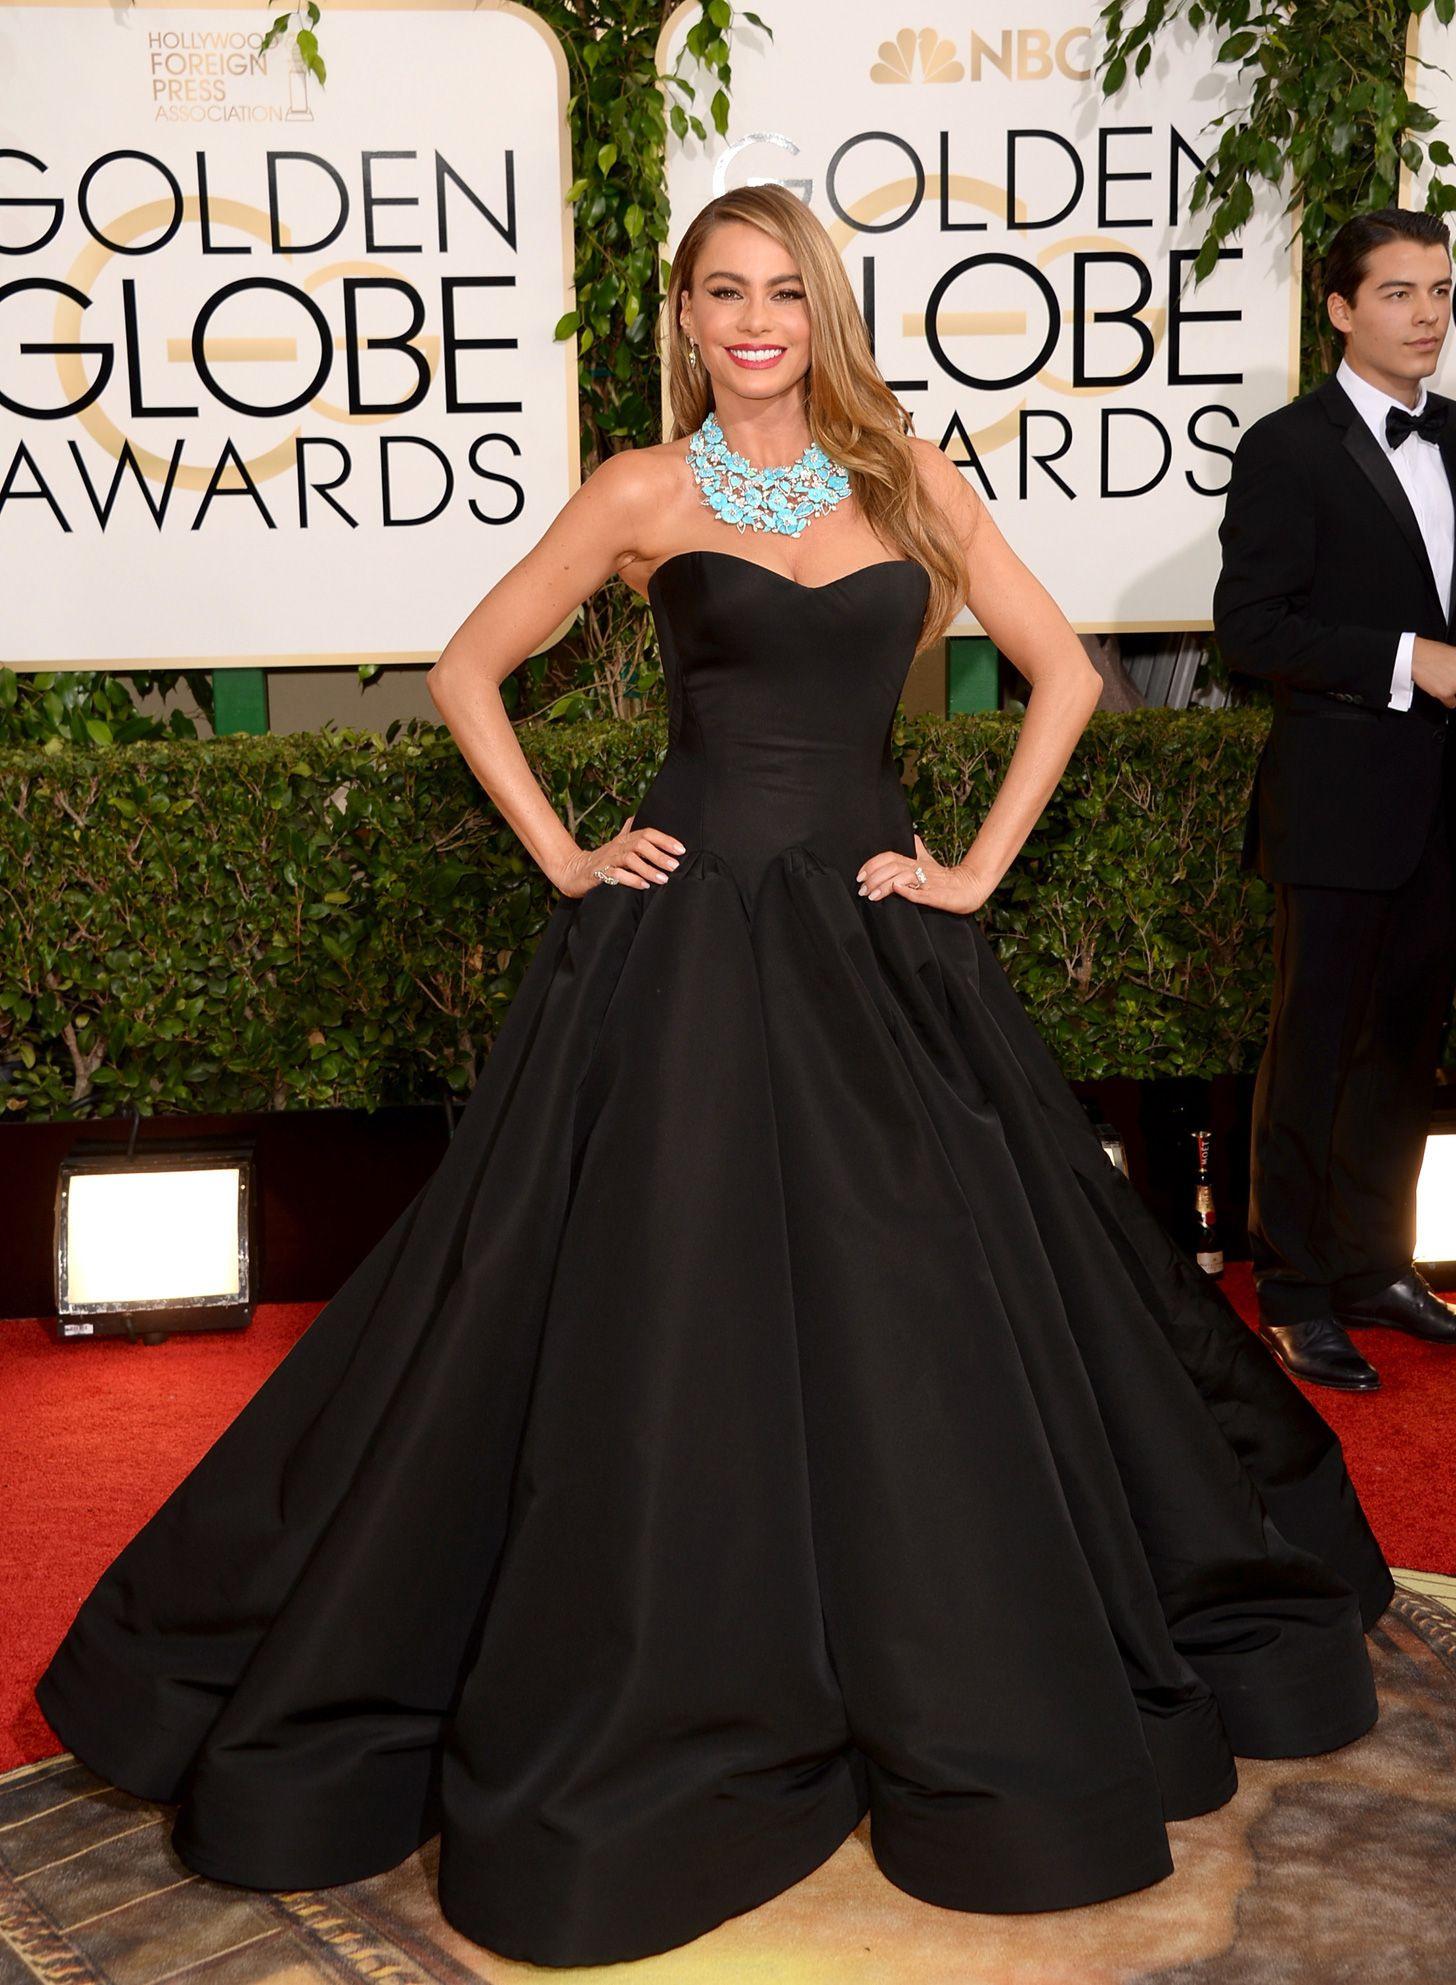 20 Cool Globus Abendkleider Design15 Genial Globus Abendkleider Bester Preis